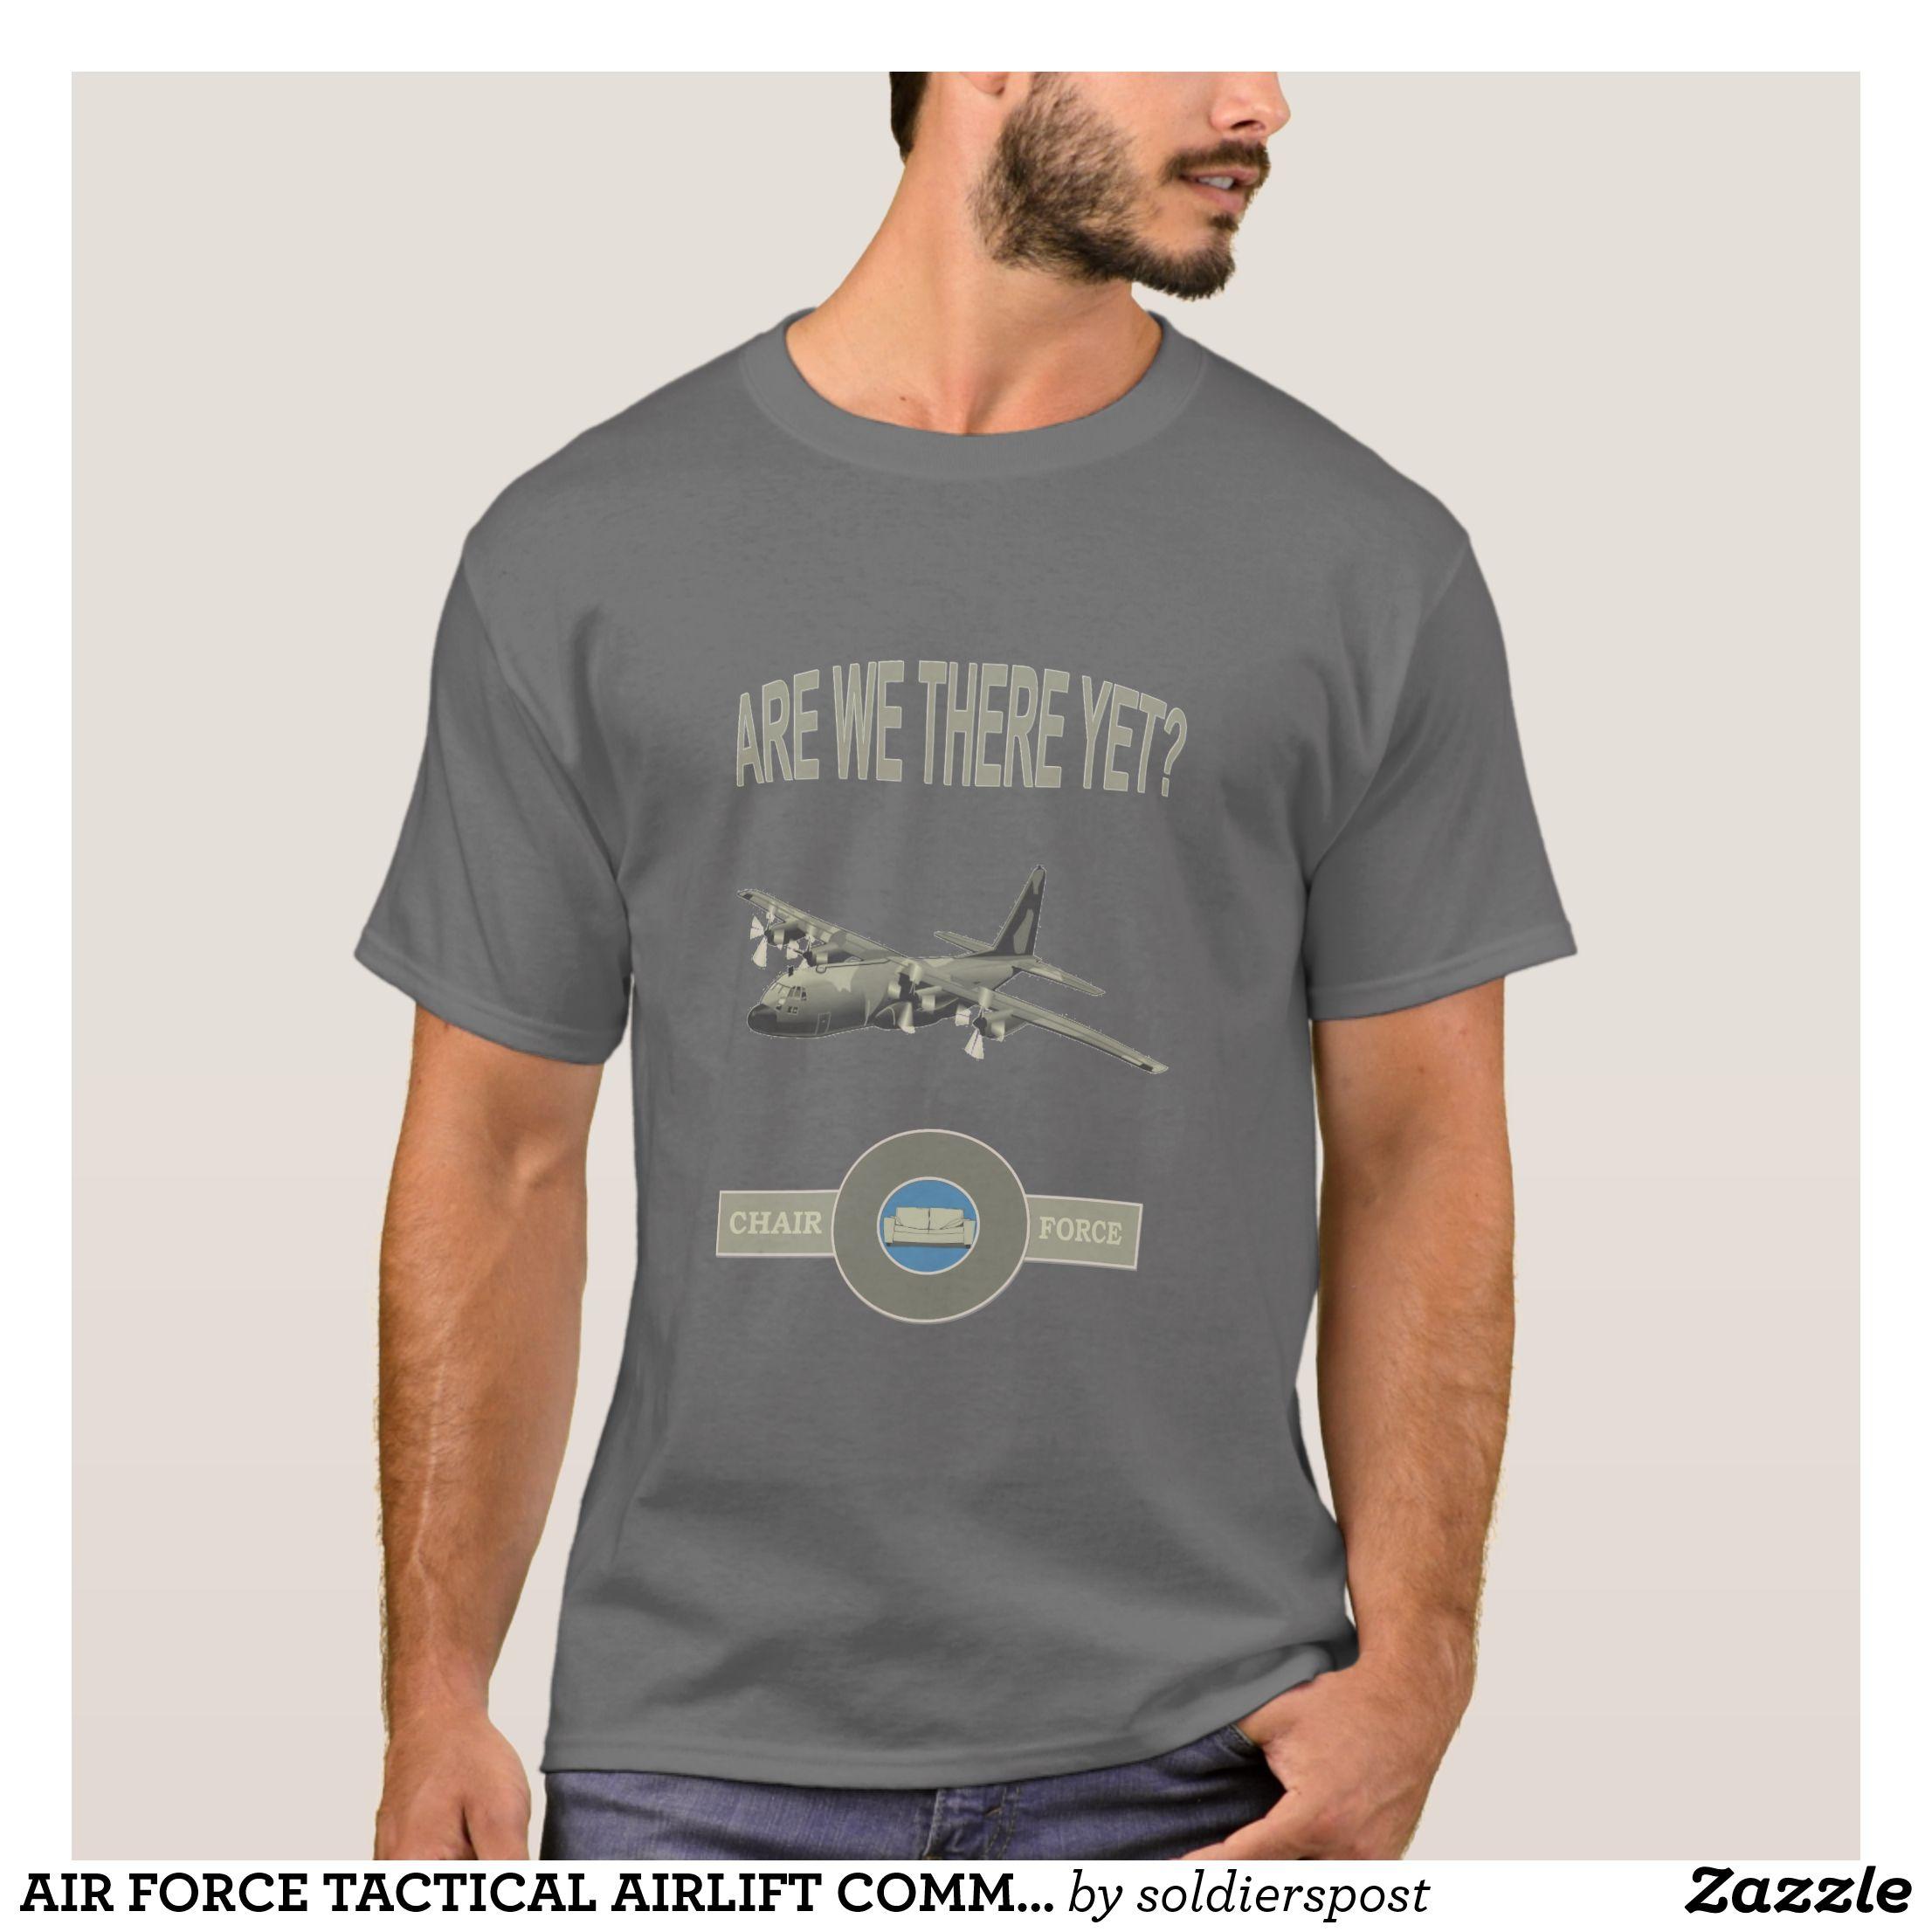 Air Force Tactical Airlift Command T Shirt Zazzle Com Tee Shirts T Shirt Printed Shirts